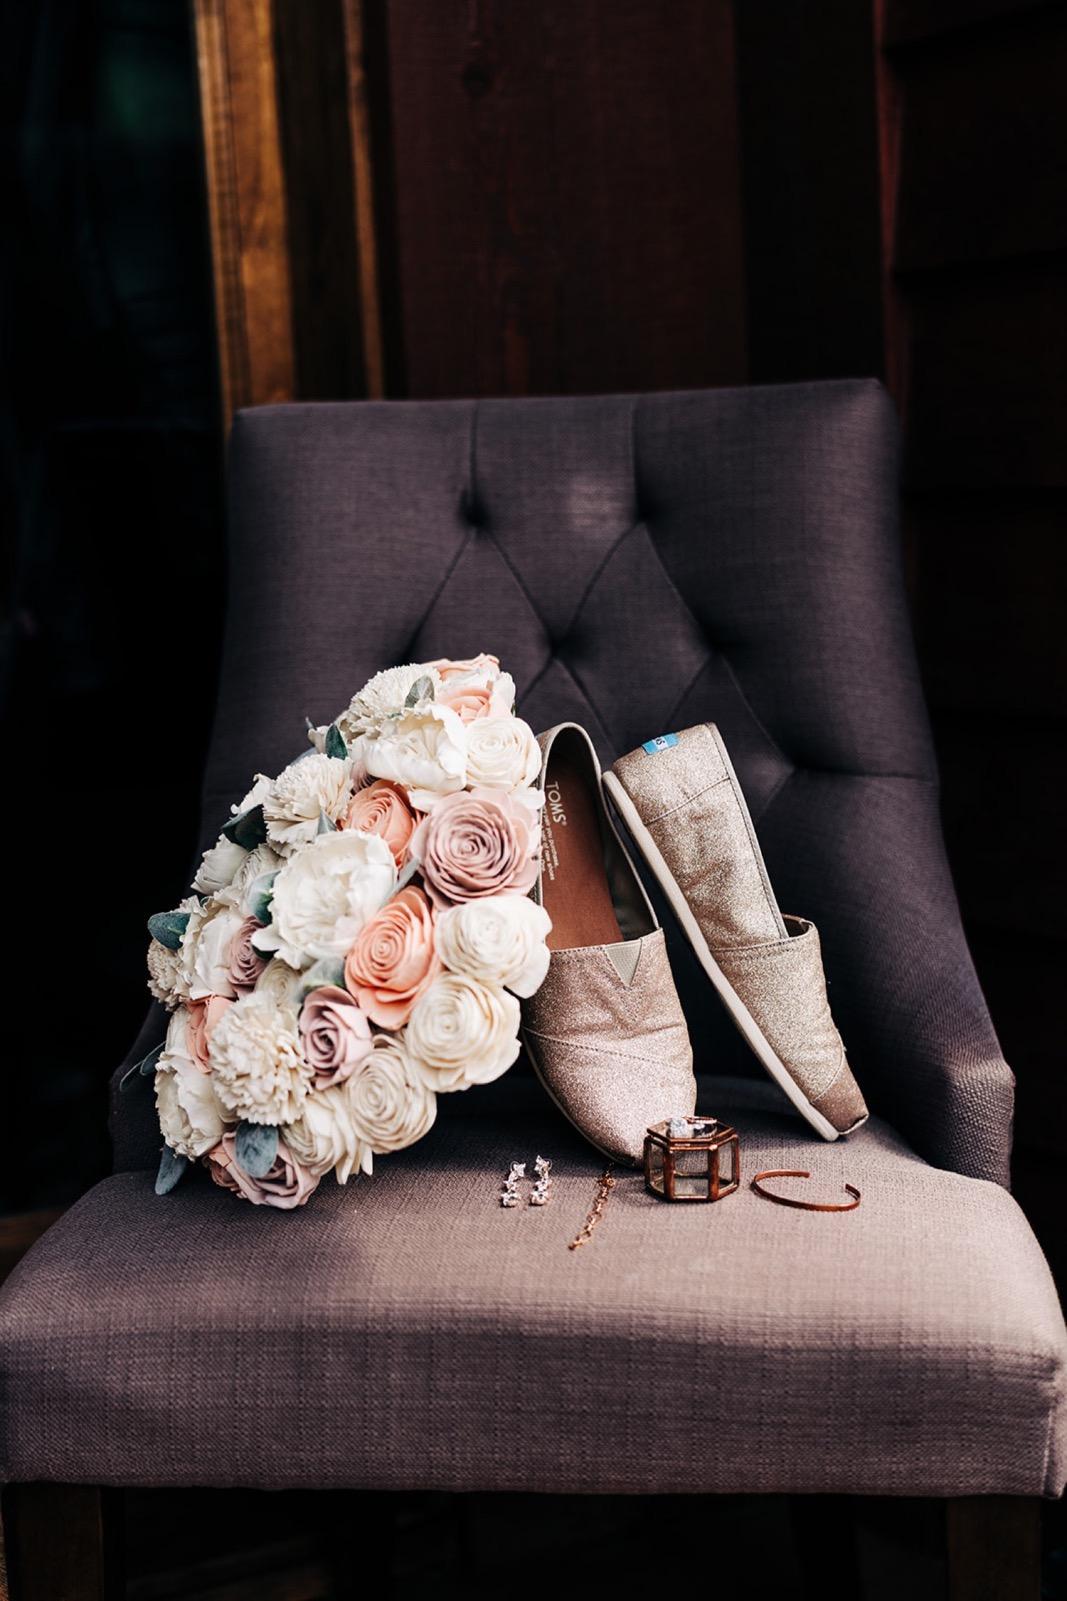 006_falissa_heather_wedding-16.jpg